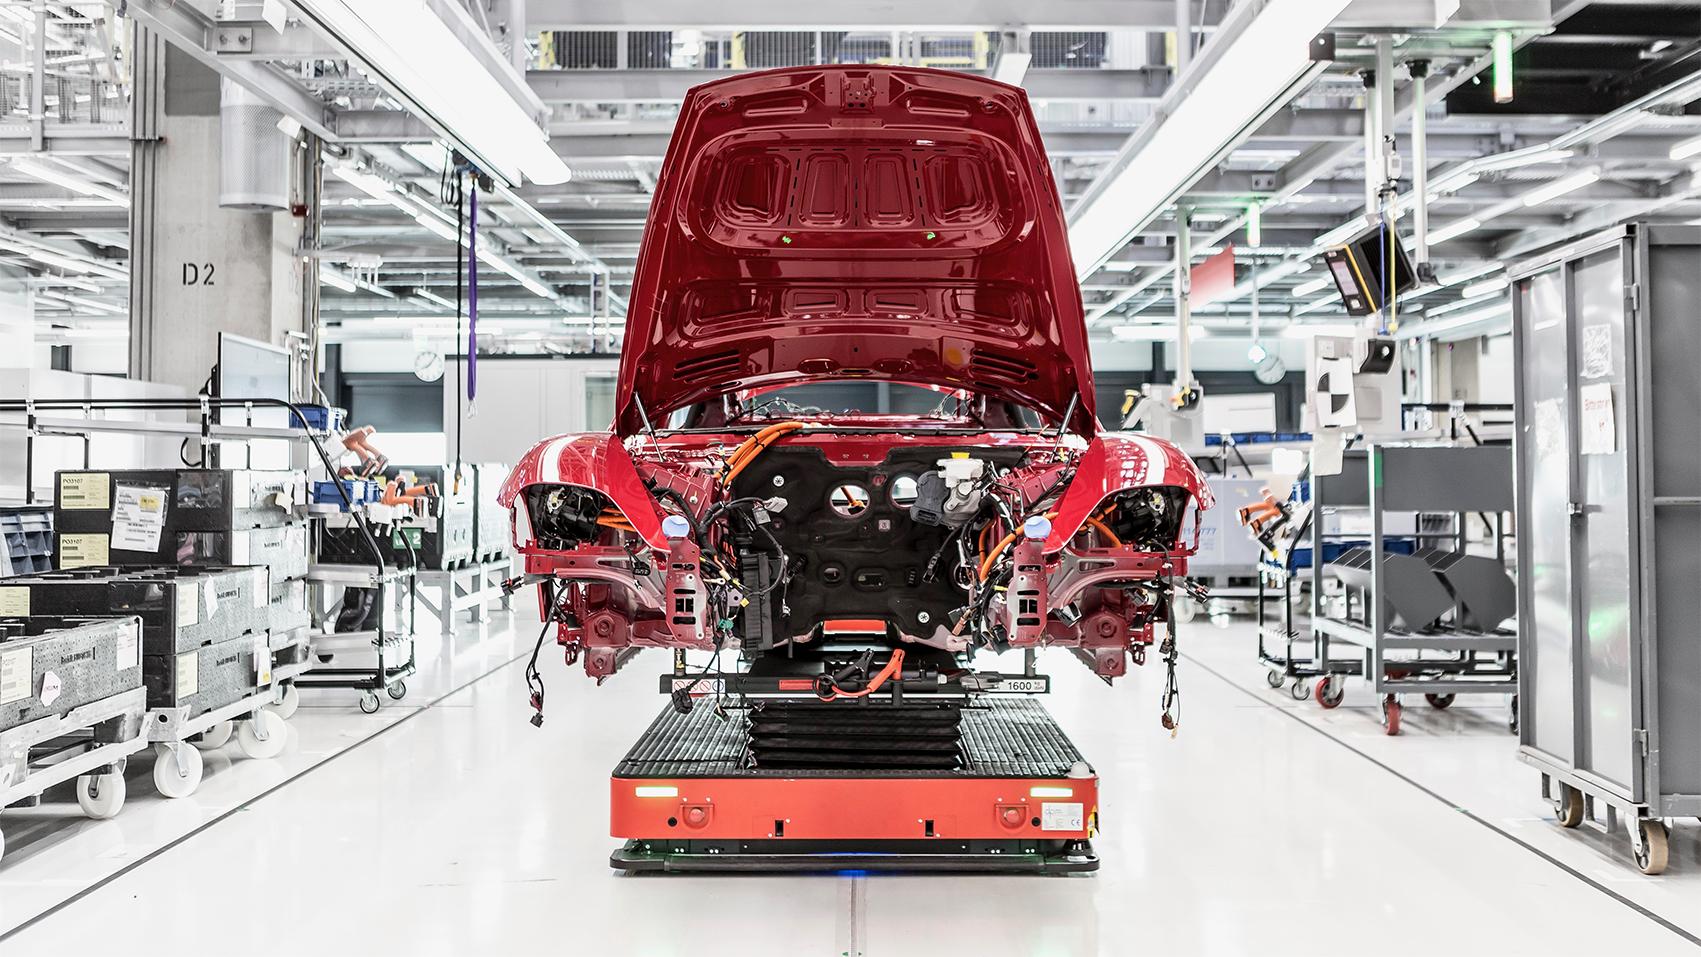 Taycan於新一代工廠中的生產模式名為「保時捷生產4.0」,其遵循三個原則:智慧生產,簡潔生產和綠能生產。